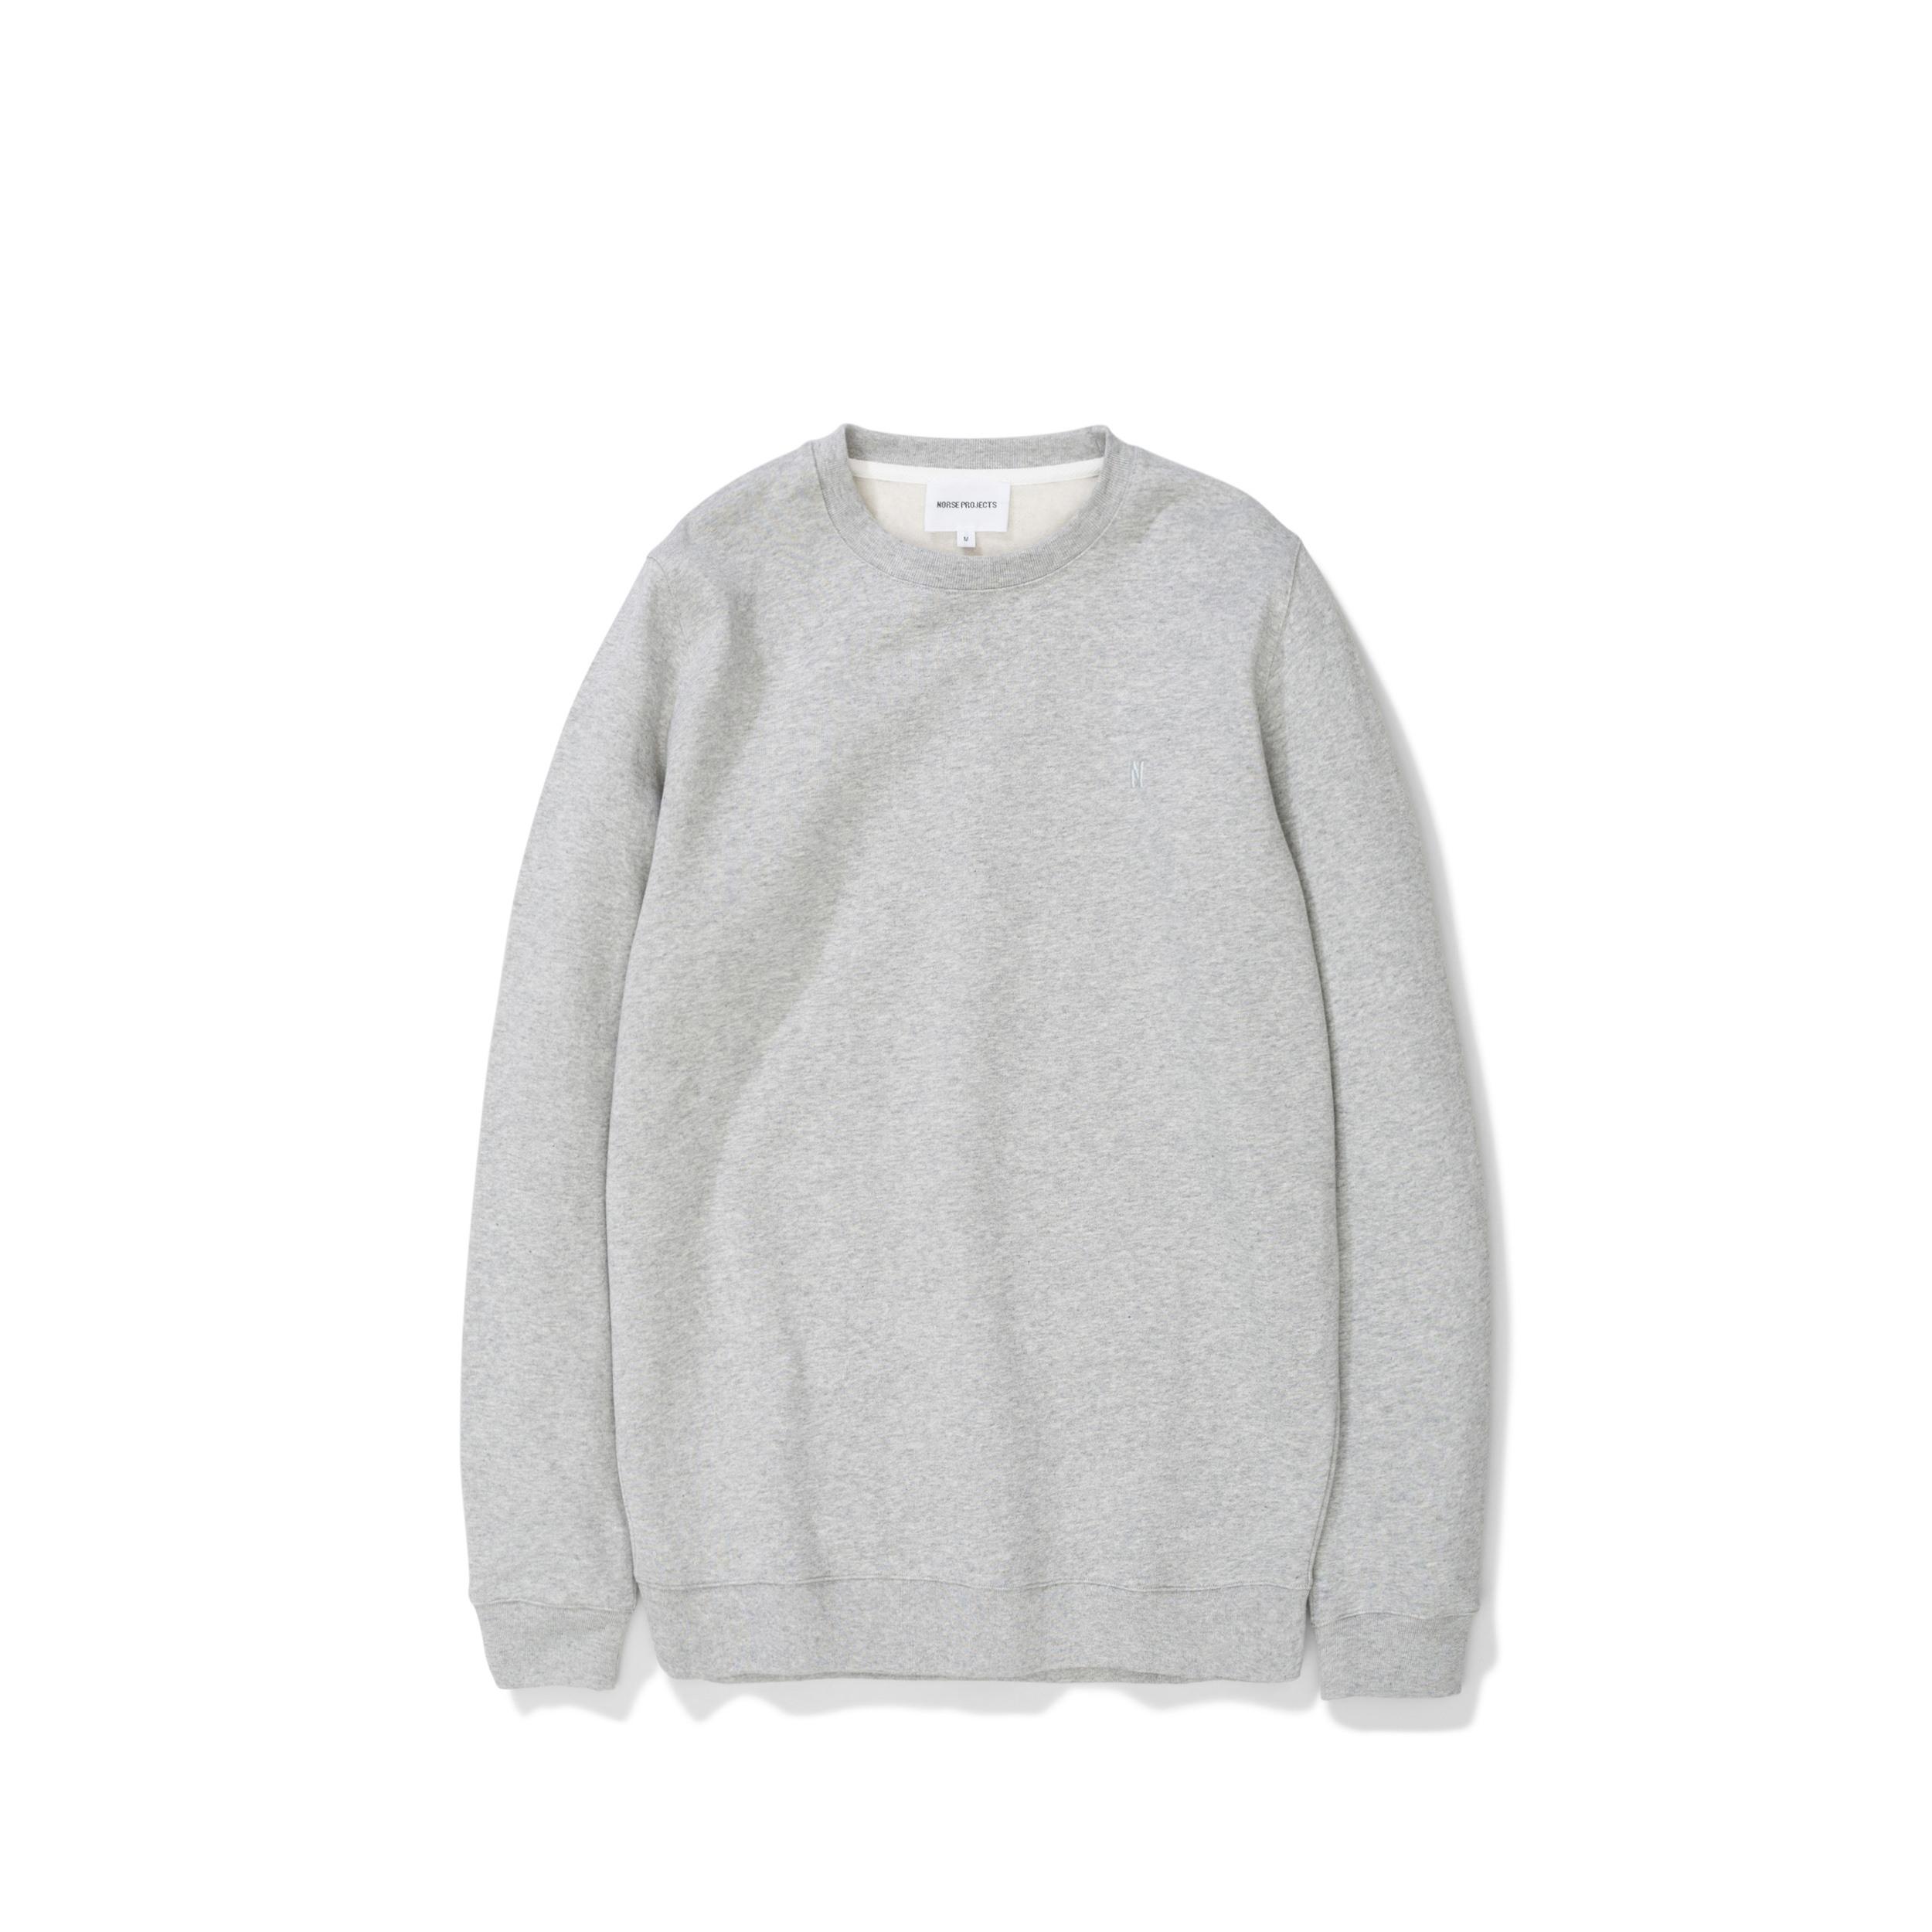 b1faffbf9e1 Sweatshirts